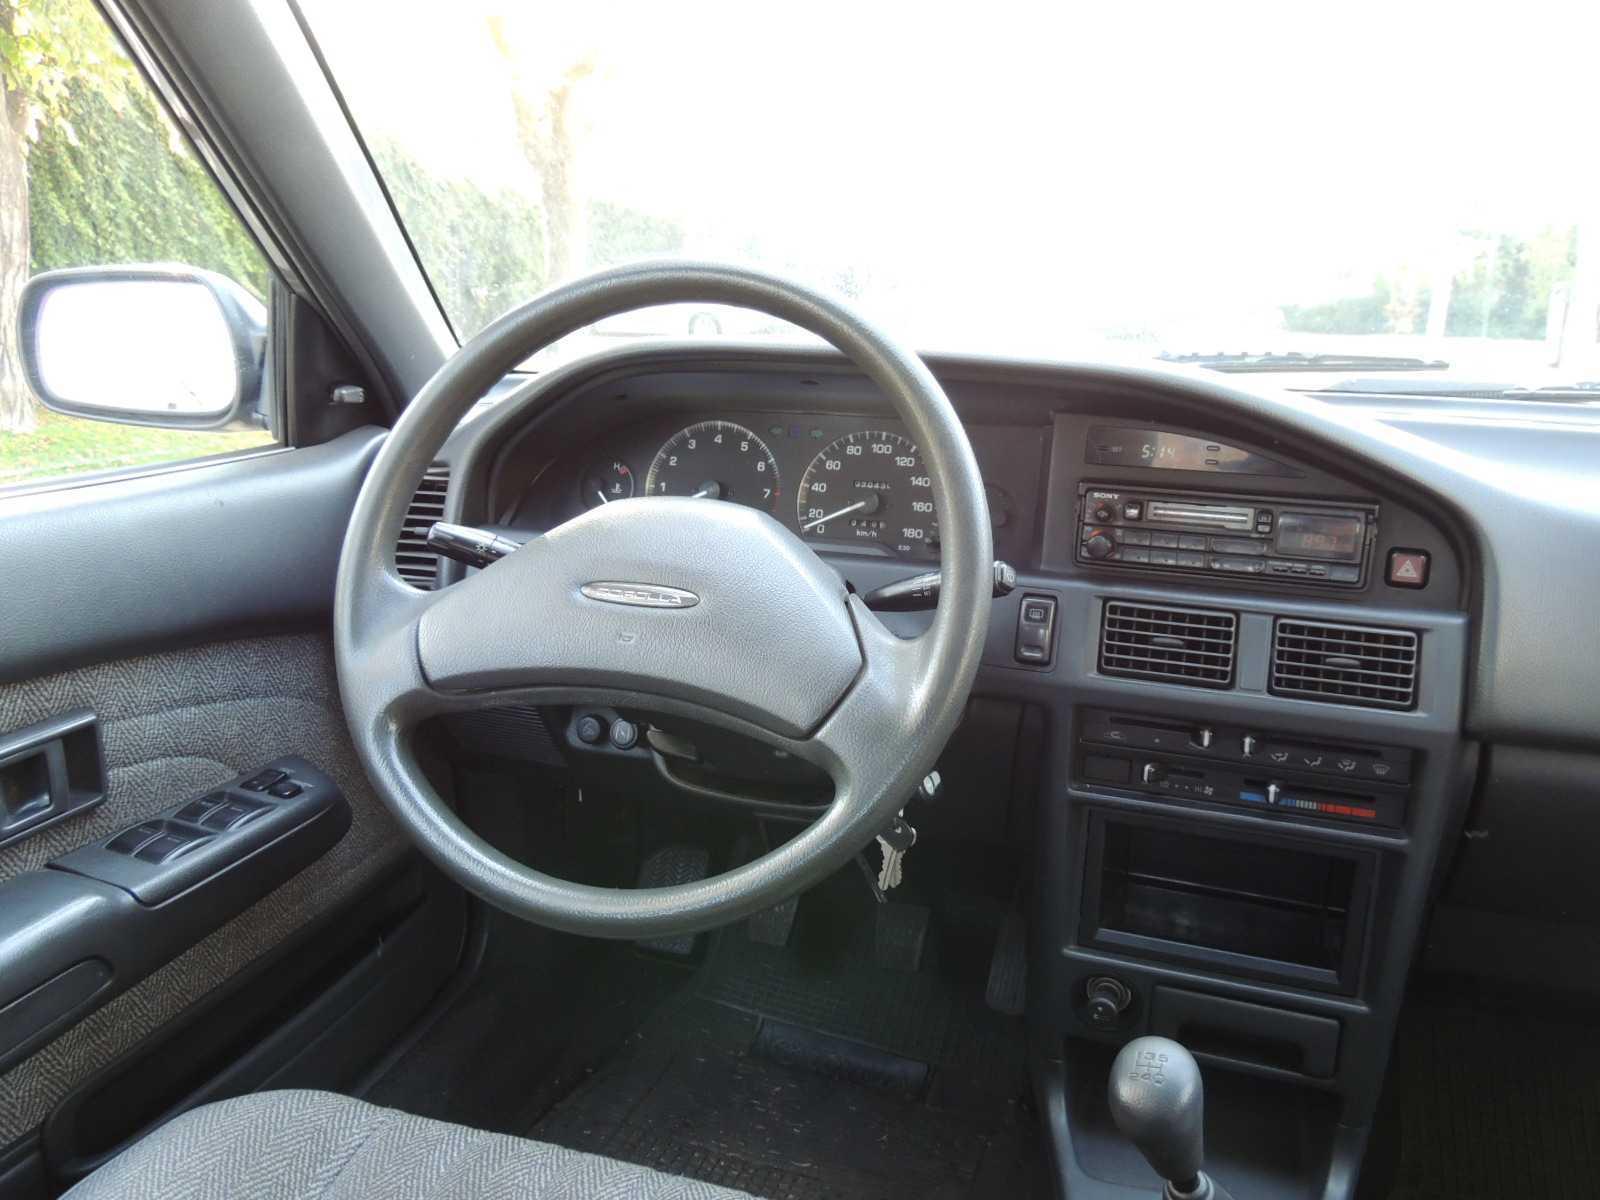 Toyota Corolla 1992 Flaco Farias Retrotest (8)